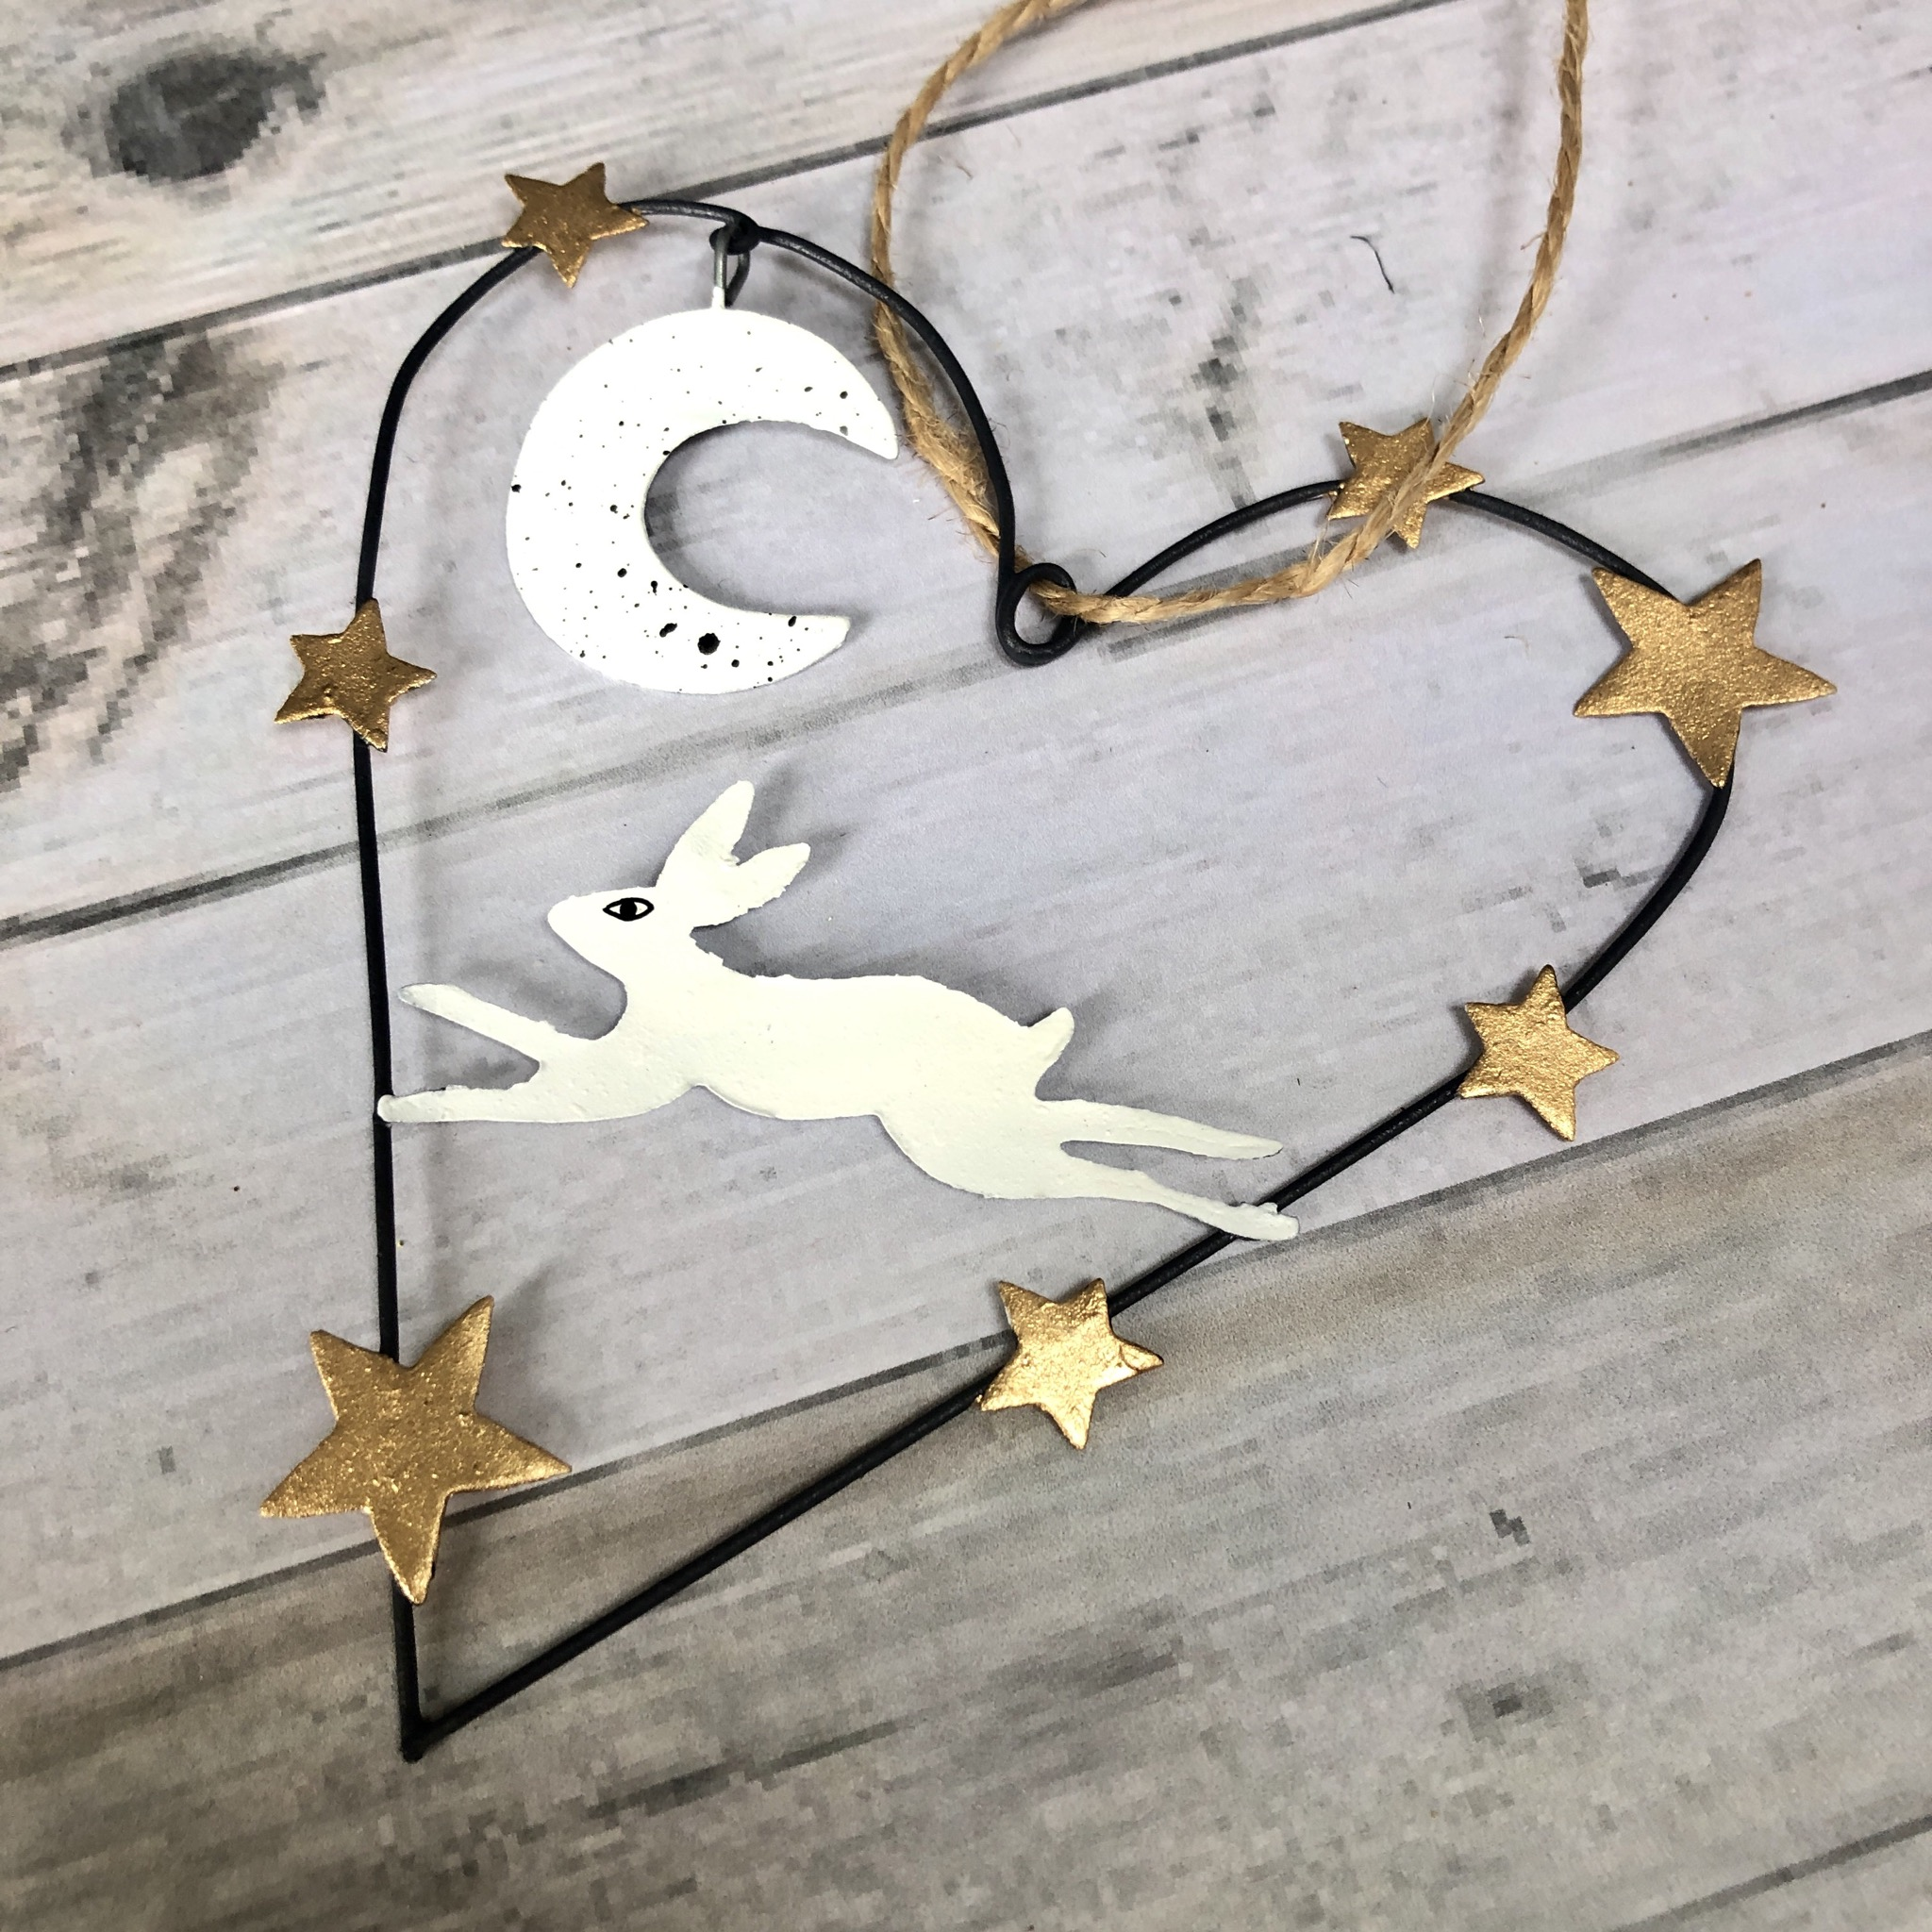 Artic hare heart hanging Christmas decoration by shoeless joe